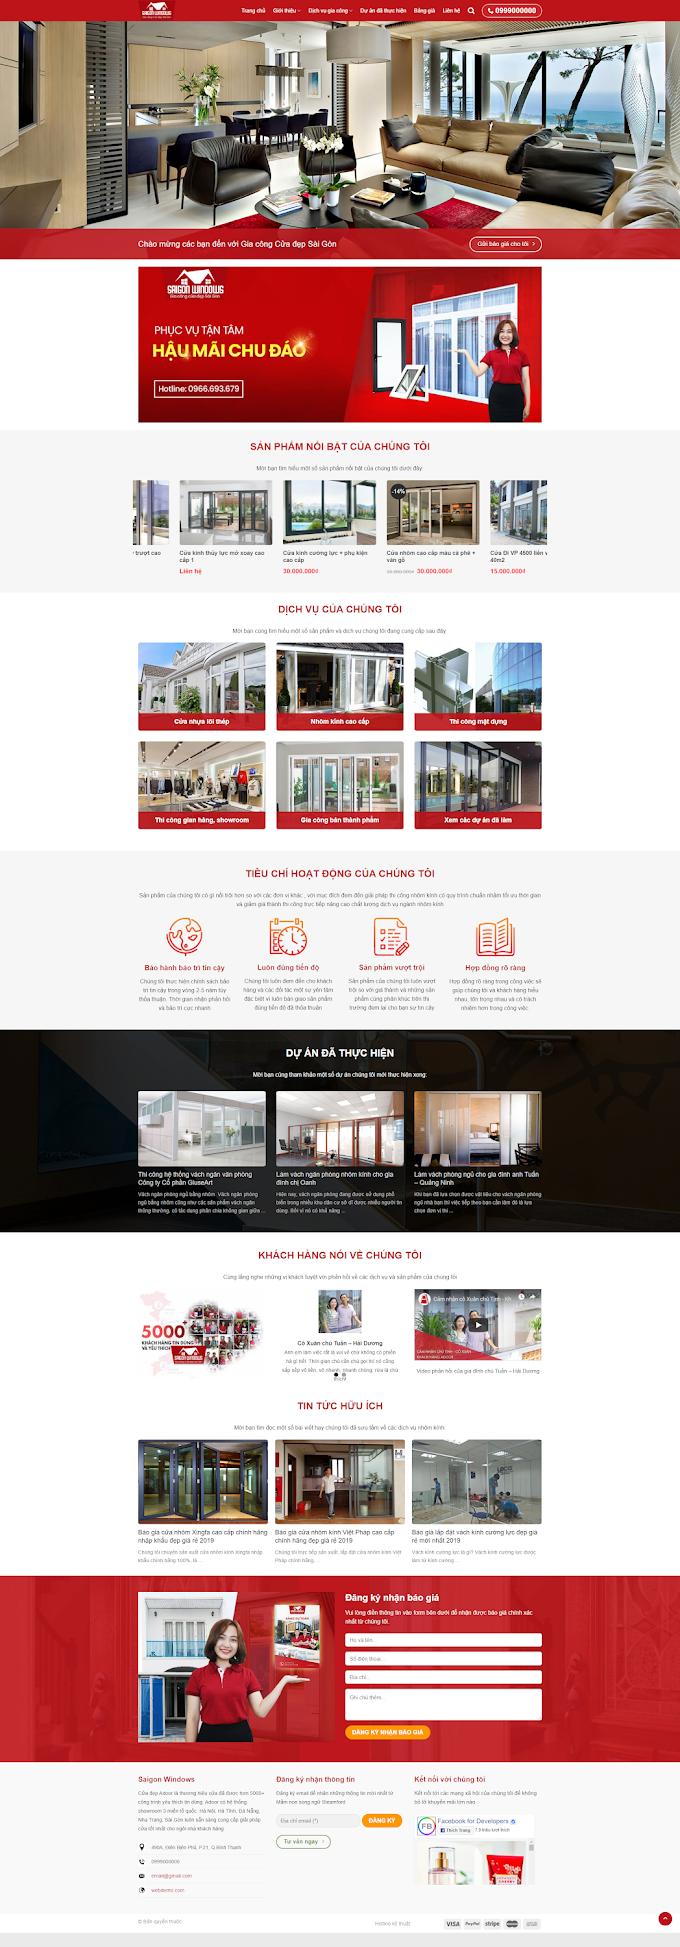 Mẫu website Nhôm Kính - cơ khí